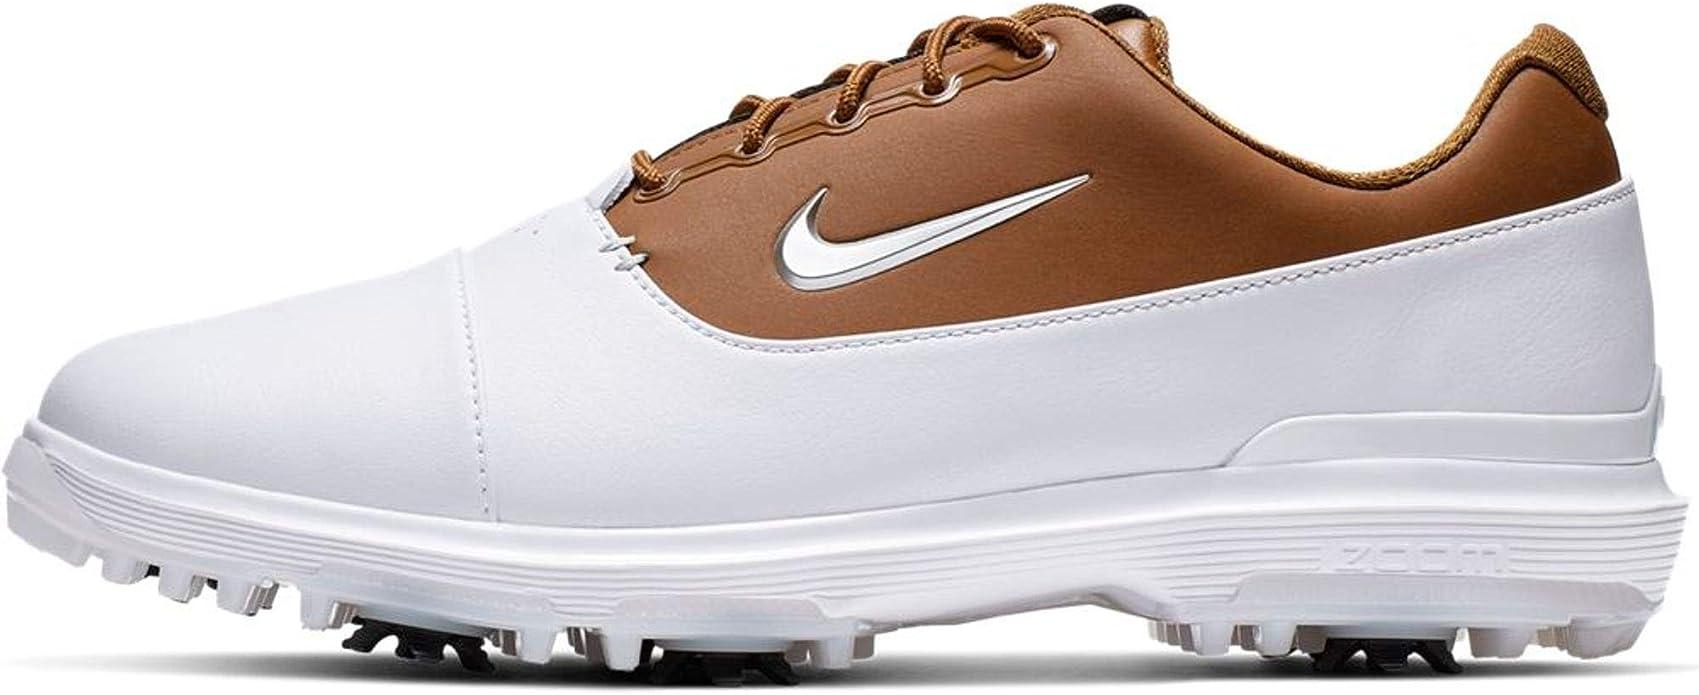 chaussures de golf nike air zoom precision